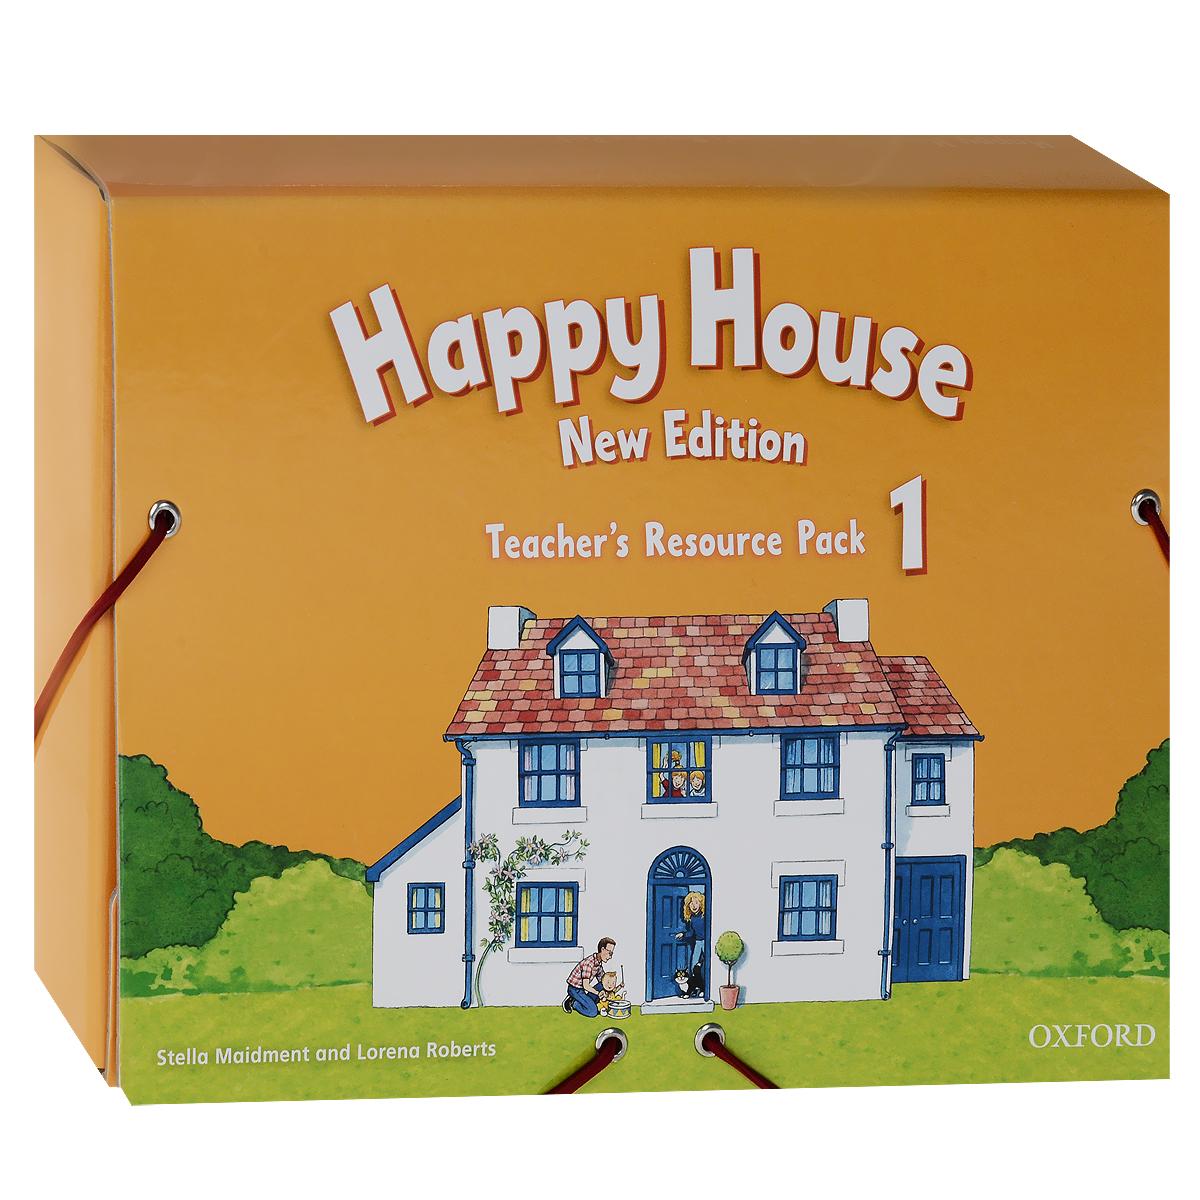 Happy House 1: Teachers Resource Pack (комплект из 2 книг + 73 карточки, 3 мягких игрушки) access 3 teachers resource pack pre intermediate комплект для учителей